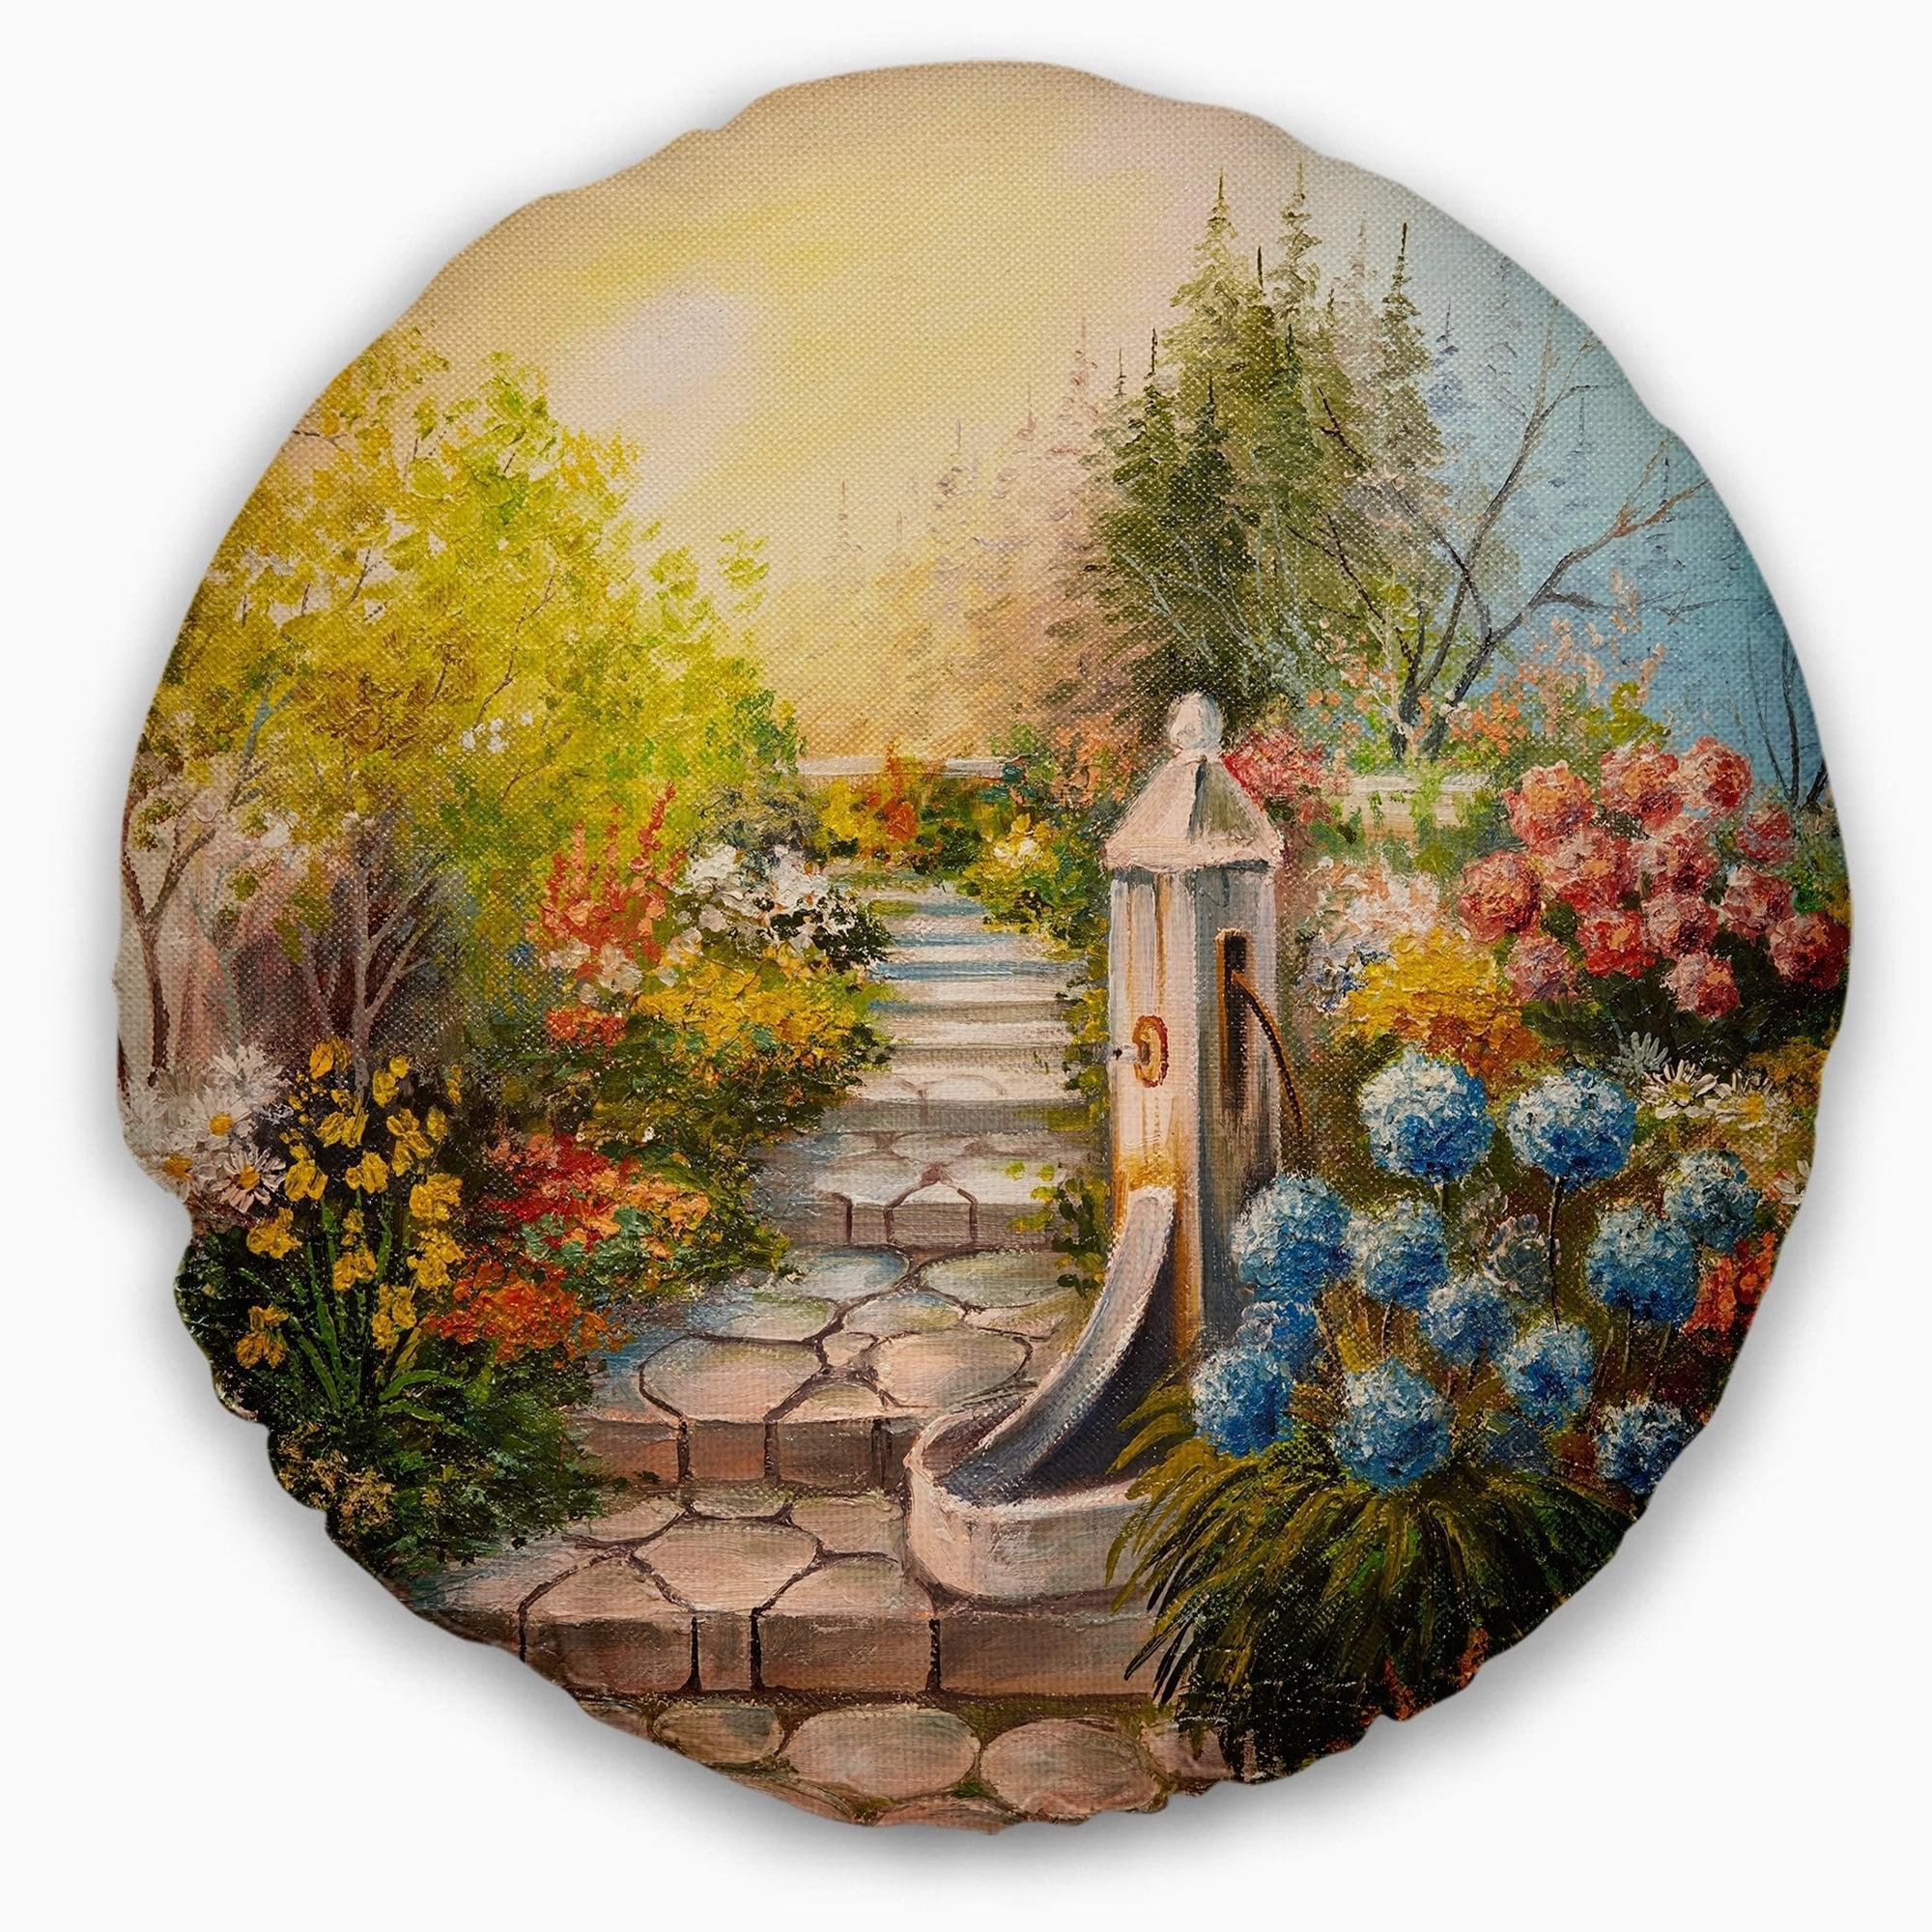 Design Art Designart Stone Stairs In Forest Landscape Painting Throw Pillow Walmart Com Walmart Com